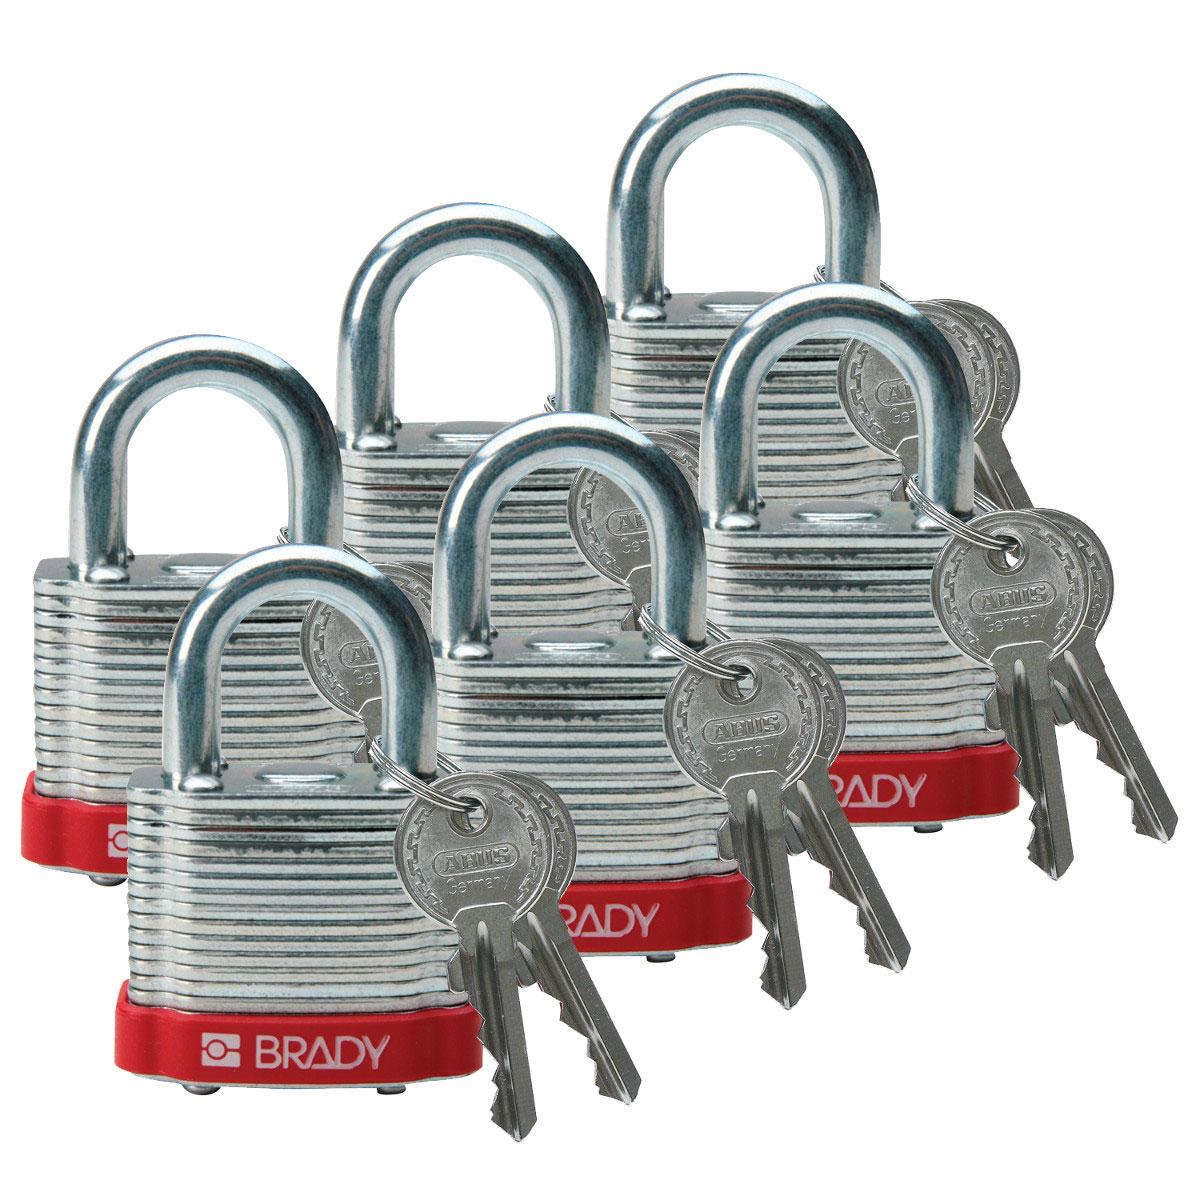 Brady® 51279 Heavy Duty Open Shackle Safety Lockout Padlock, Different Key, Red, LOTO-12 Reinforced Laminated Steel Body, 1/4 in Dia x 3/4 in H x 0.8 in W Triple Coated Hardened Steel Shackle, 1.4 in L Body